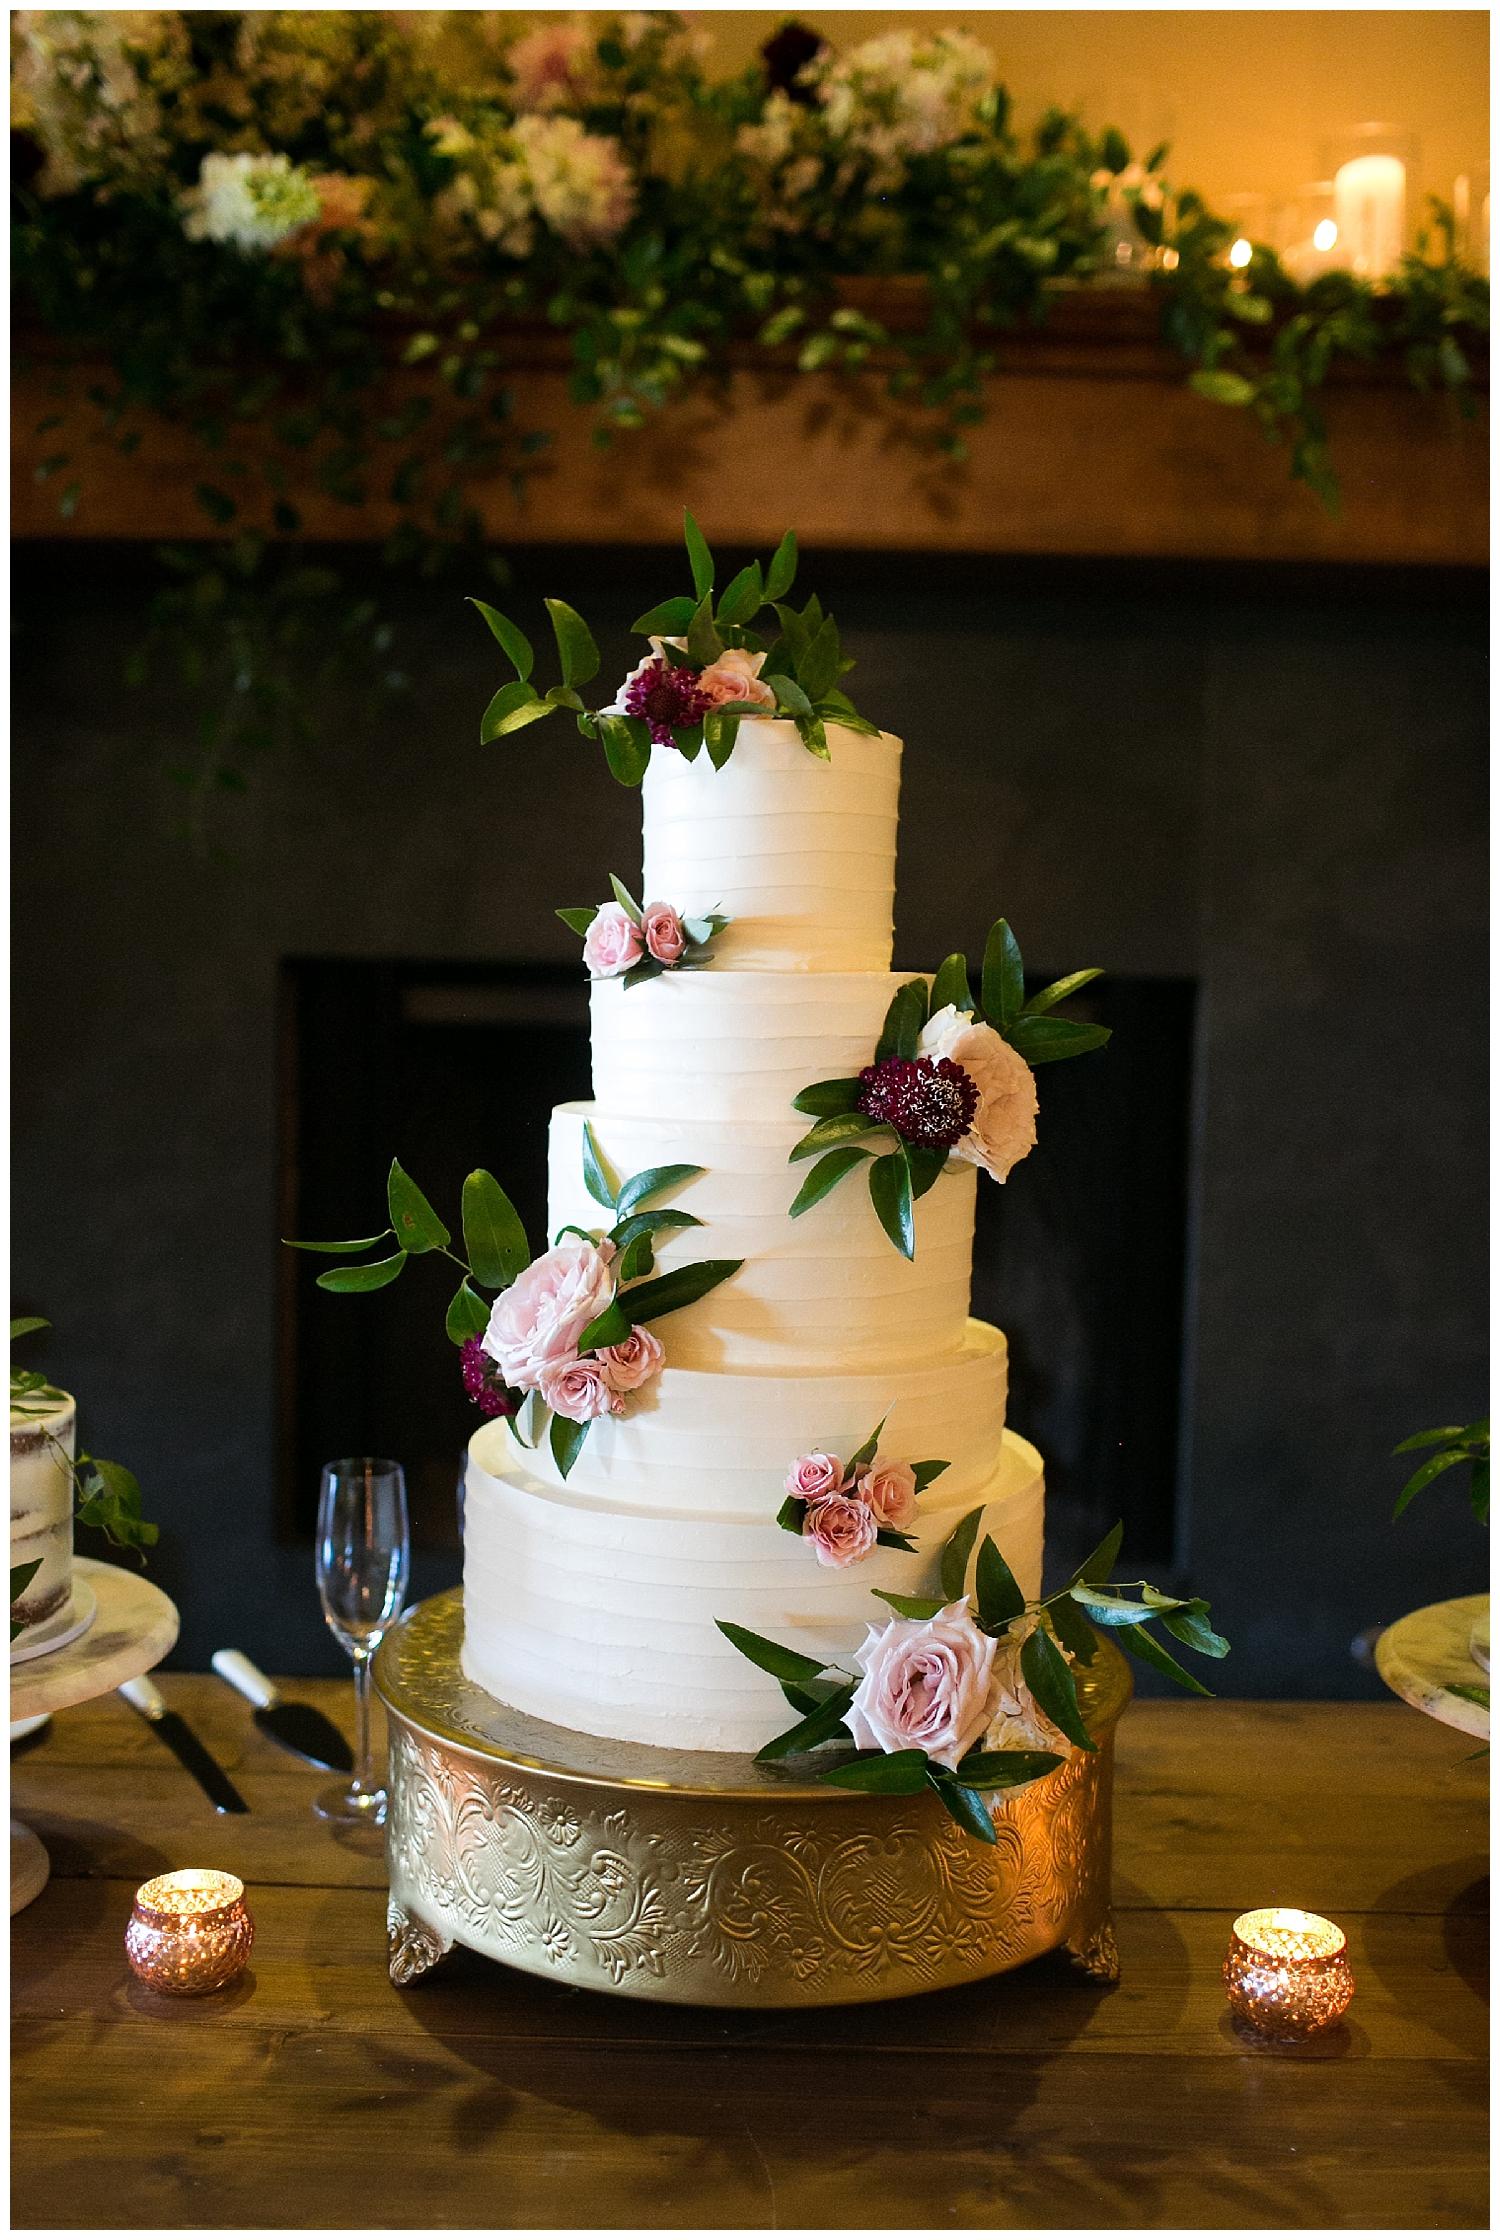 Portland_Oregon_Wedding+|+Oregon_Event_planning_and_Design10.jpg